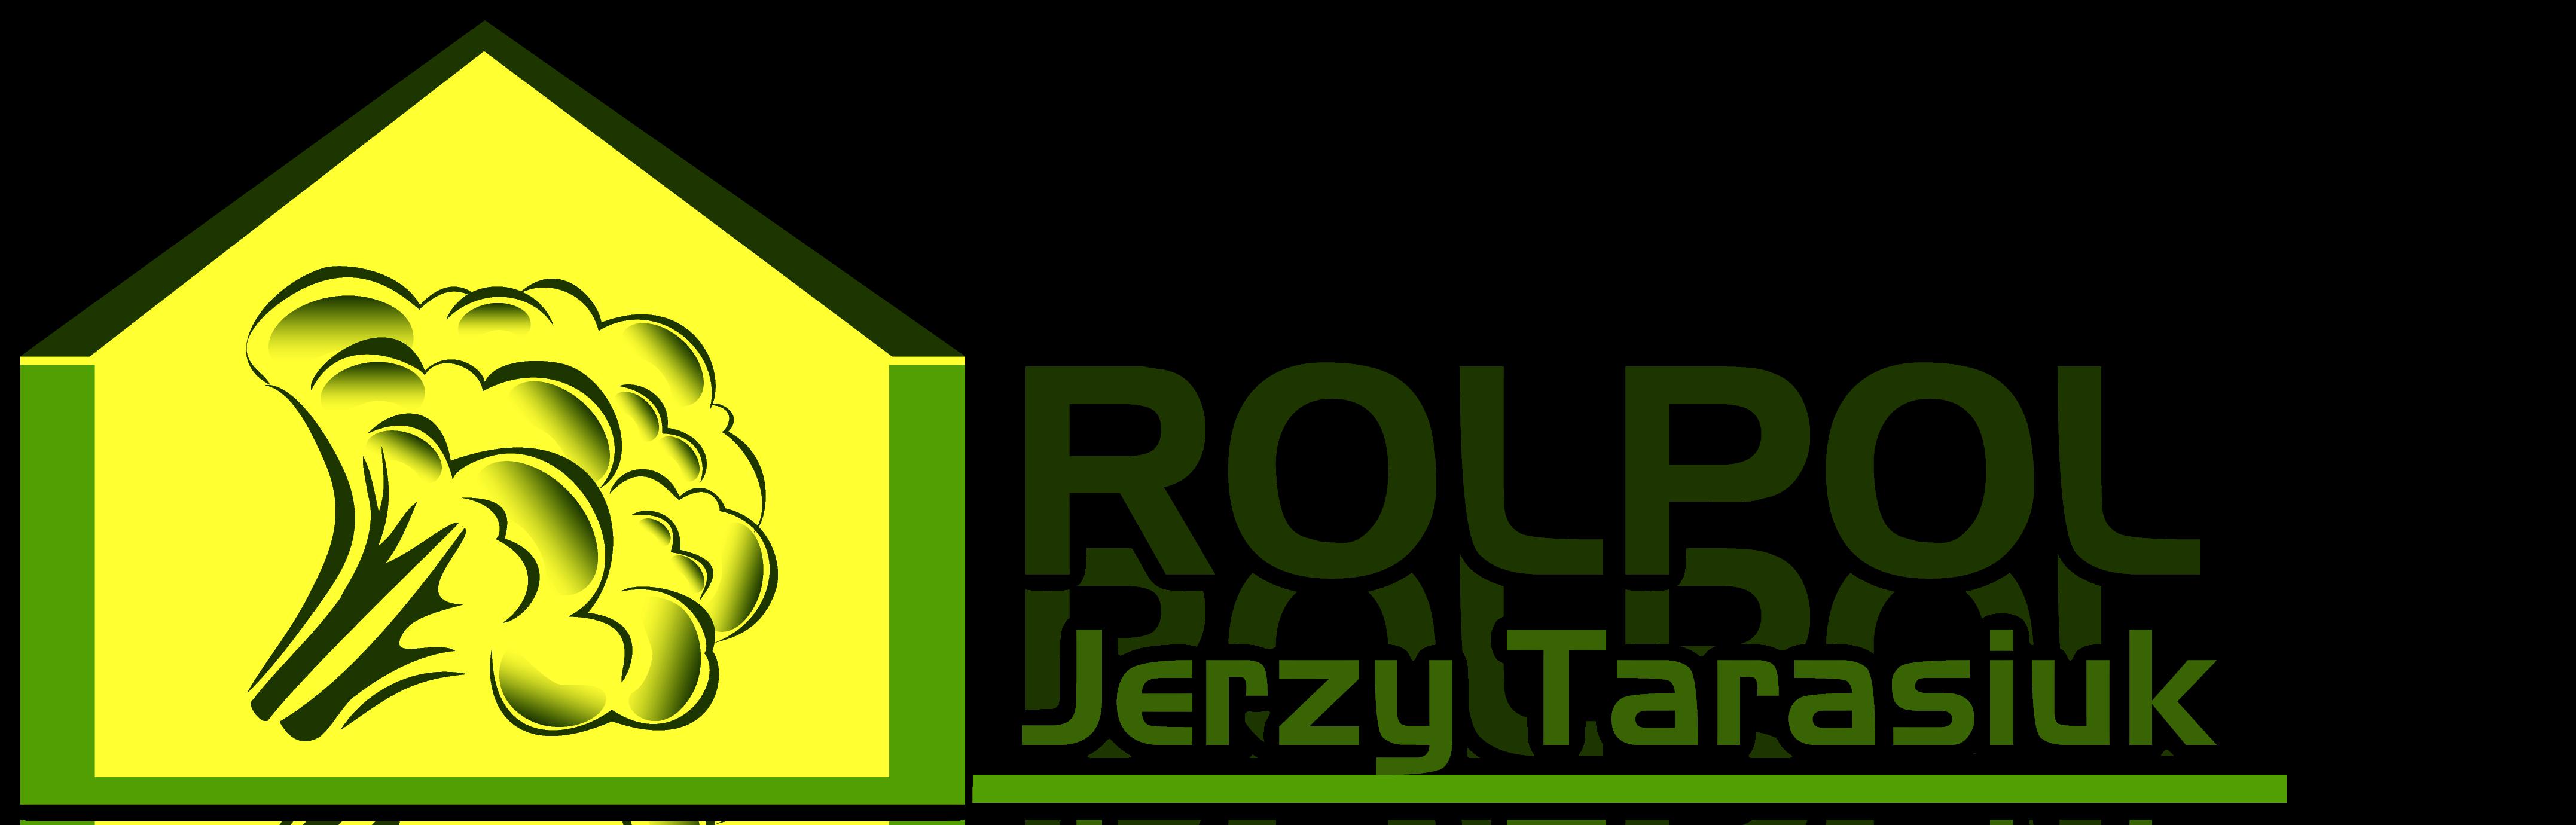 Rolpol logo